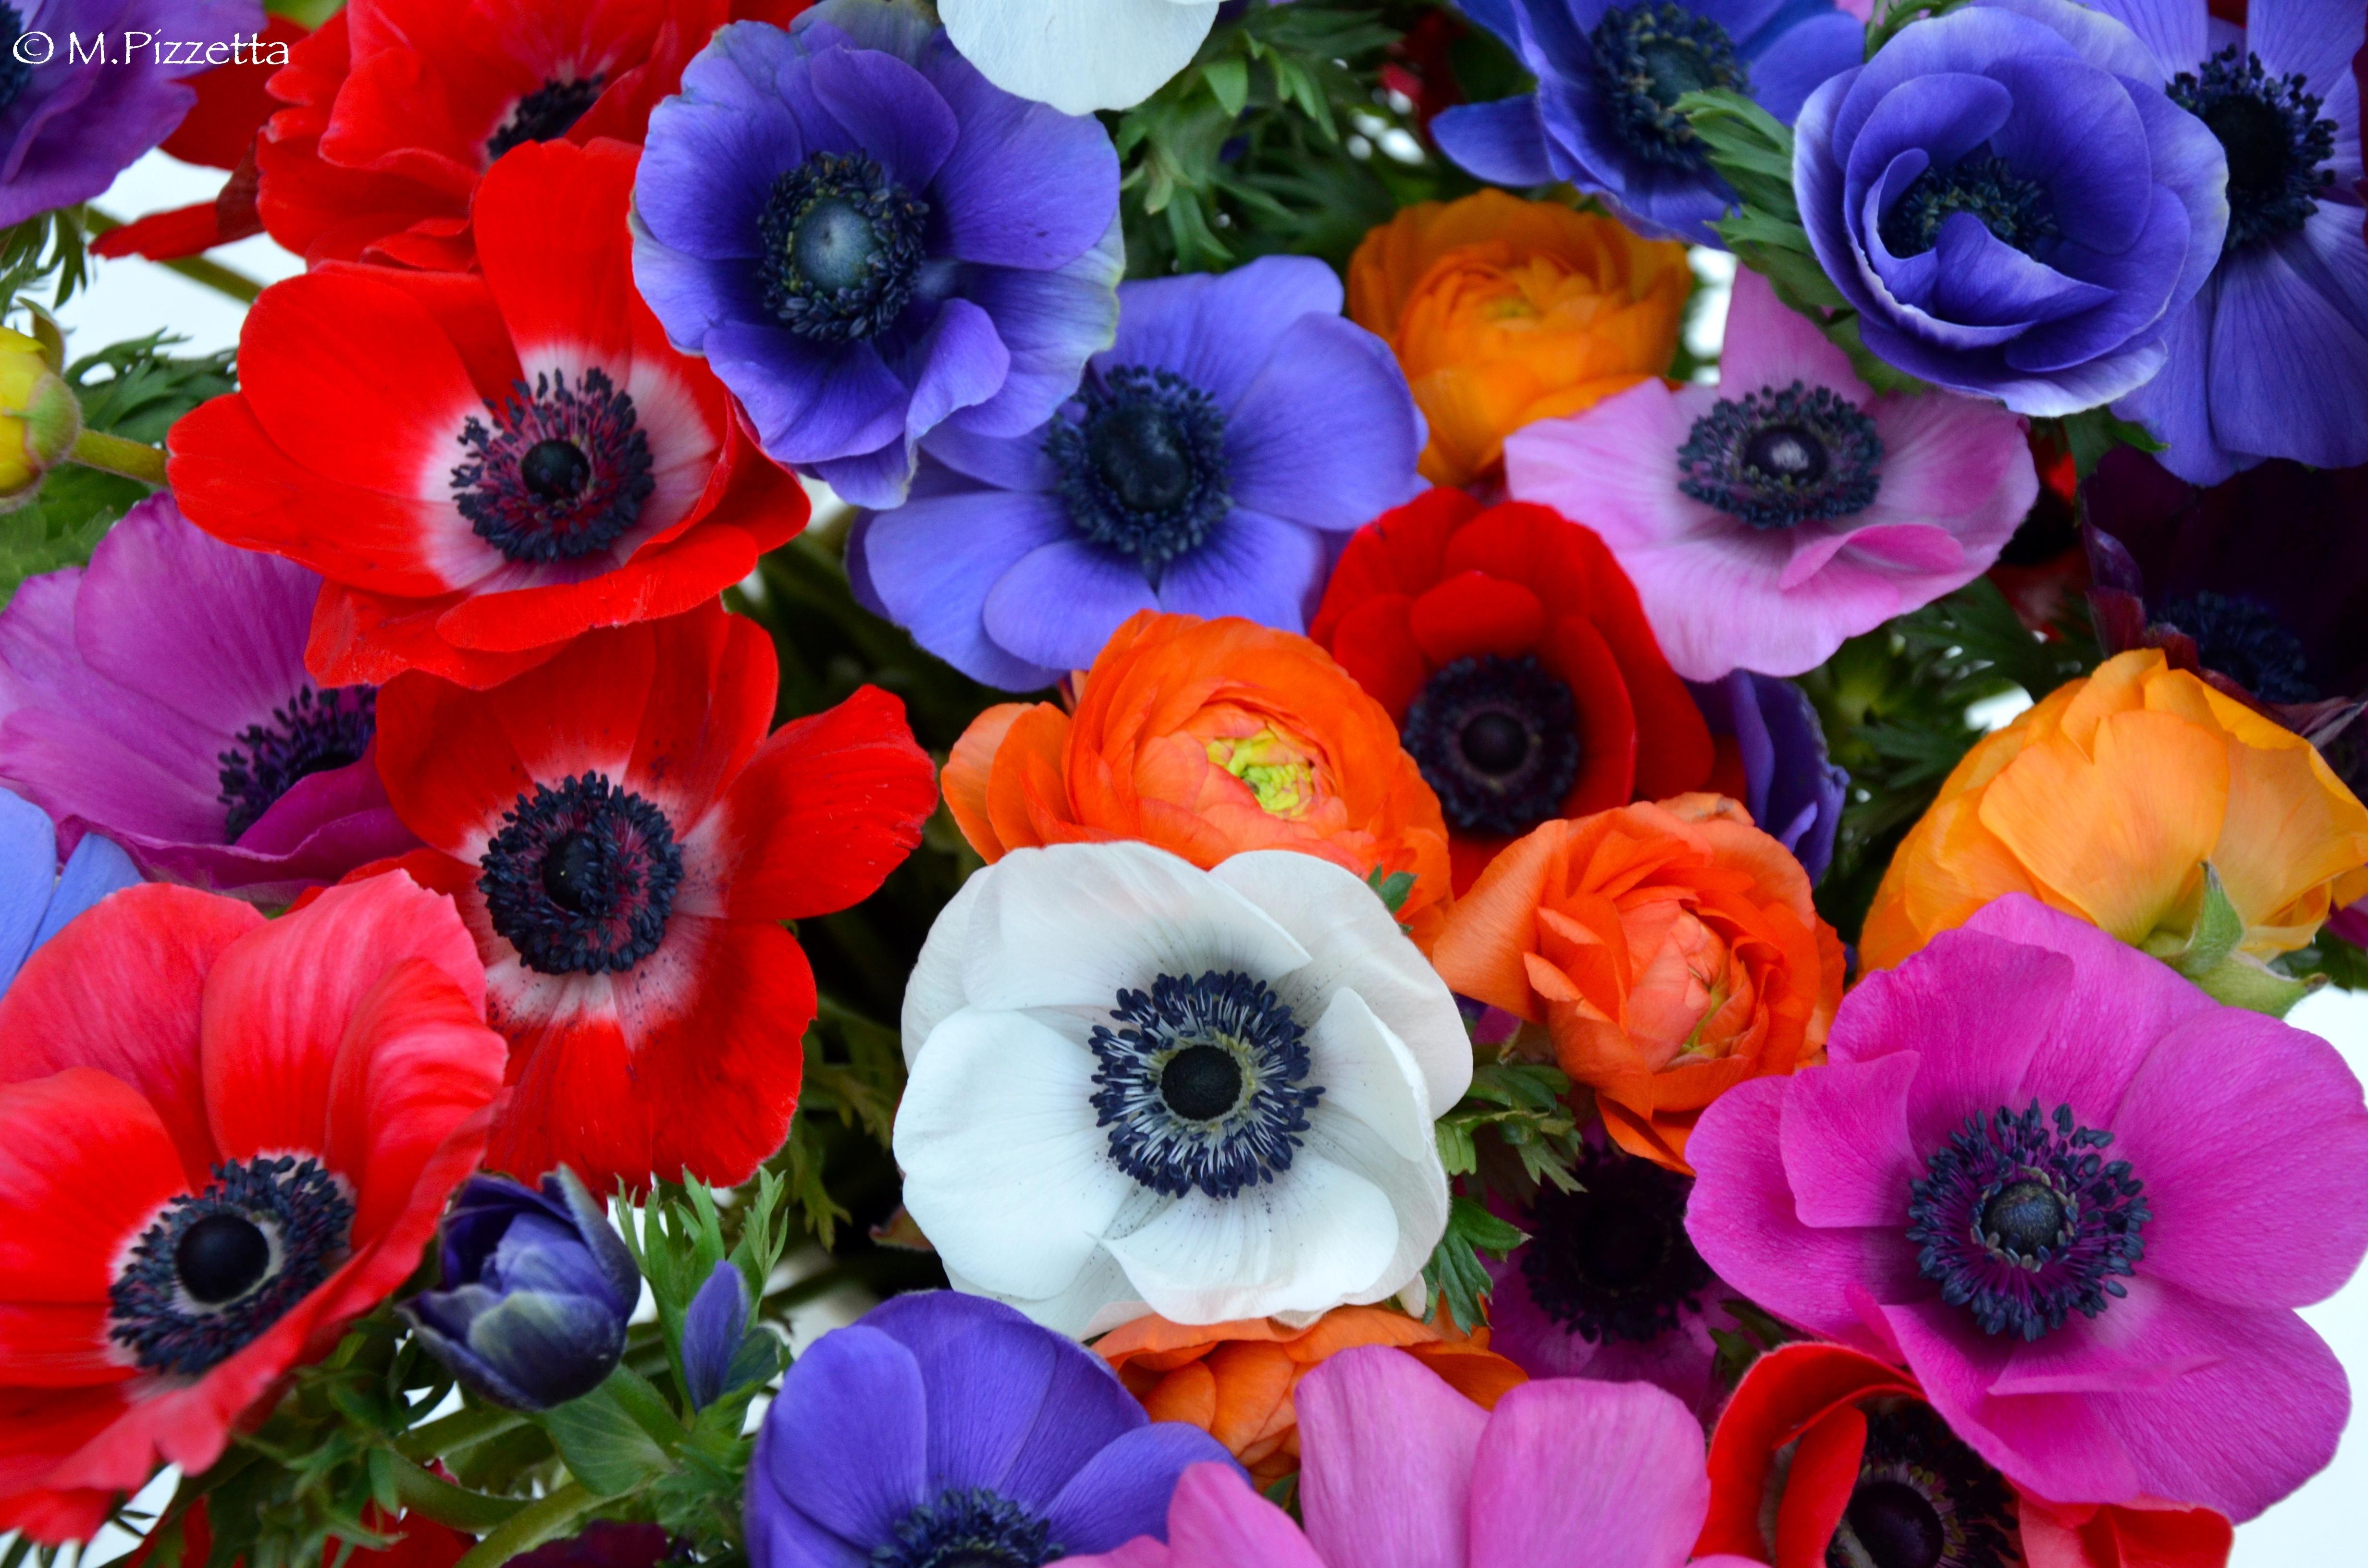 Fleurs ape 3 chens sur lman publi 27 avril 2015 at 4928 3264 in fleurs thecheapjerseys Image collections